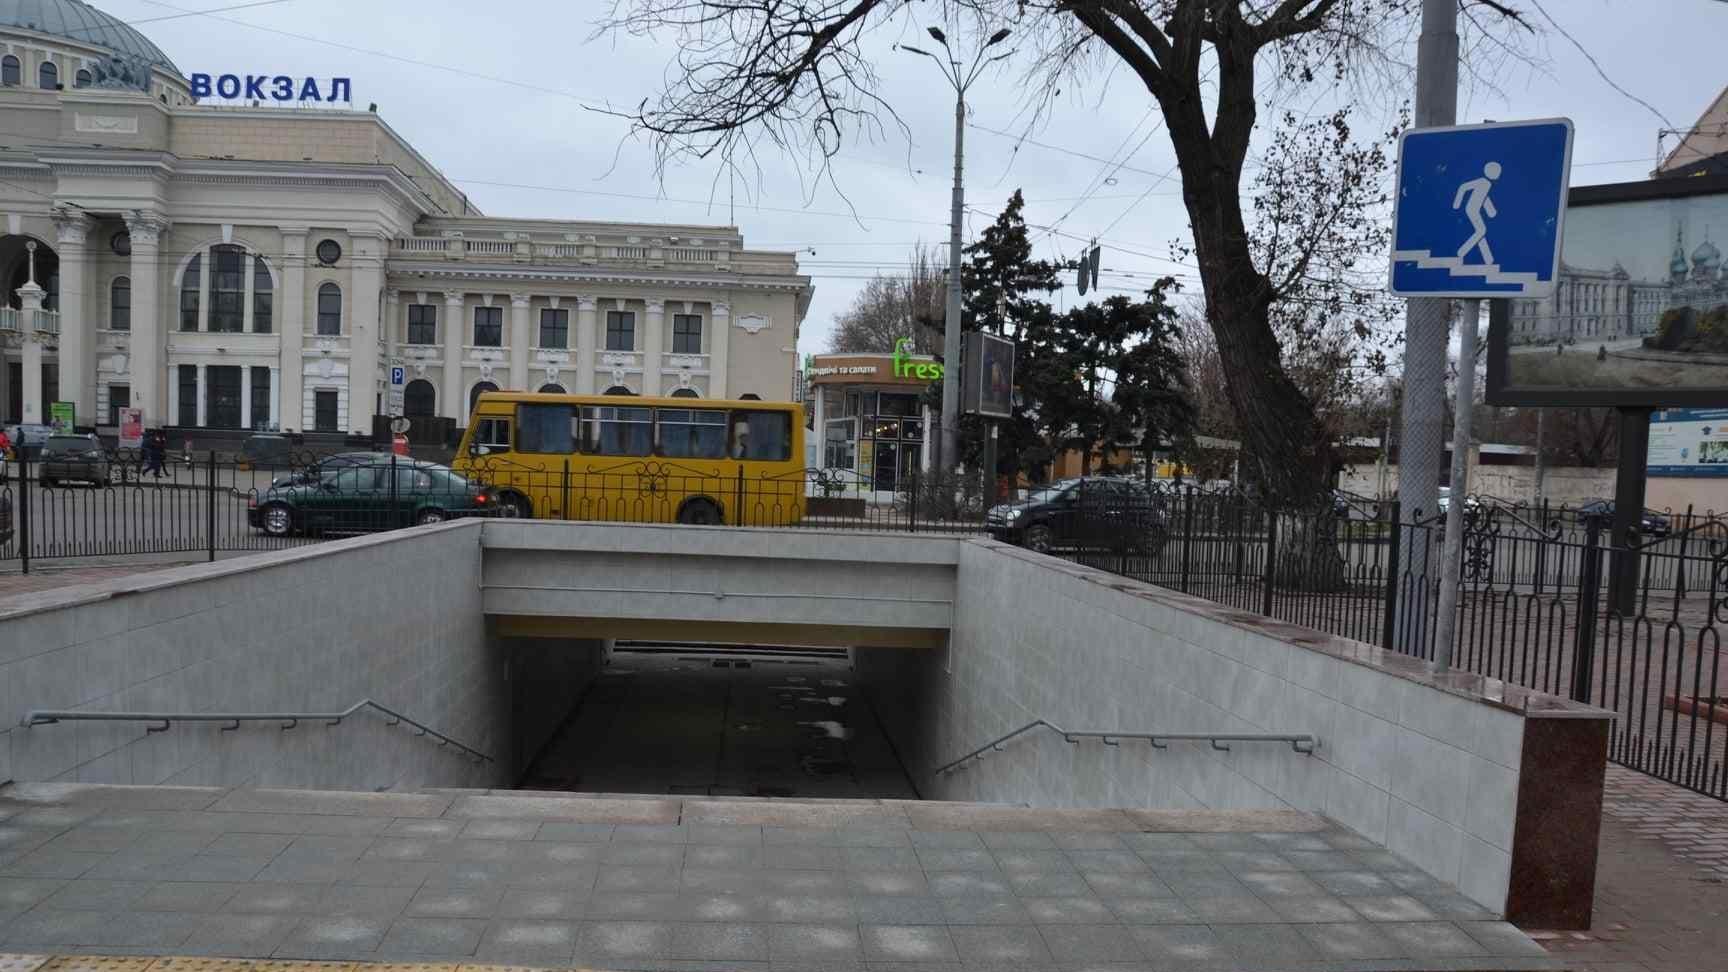 podzemnyj-perehod-u-zhd-vokzala-odessy-1_4915527b59ccb1154a0fd275c55474e0-Cropped.jpg